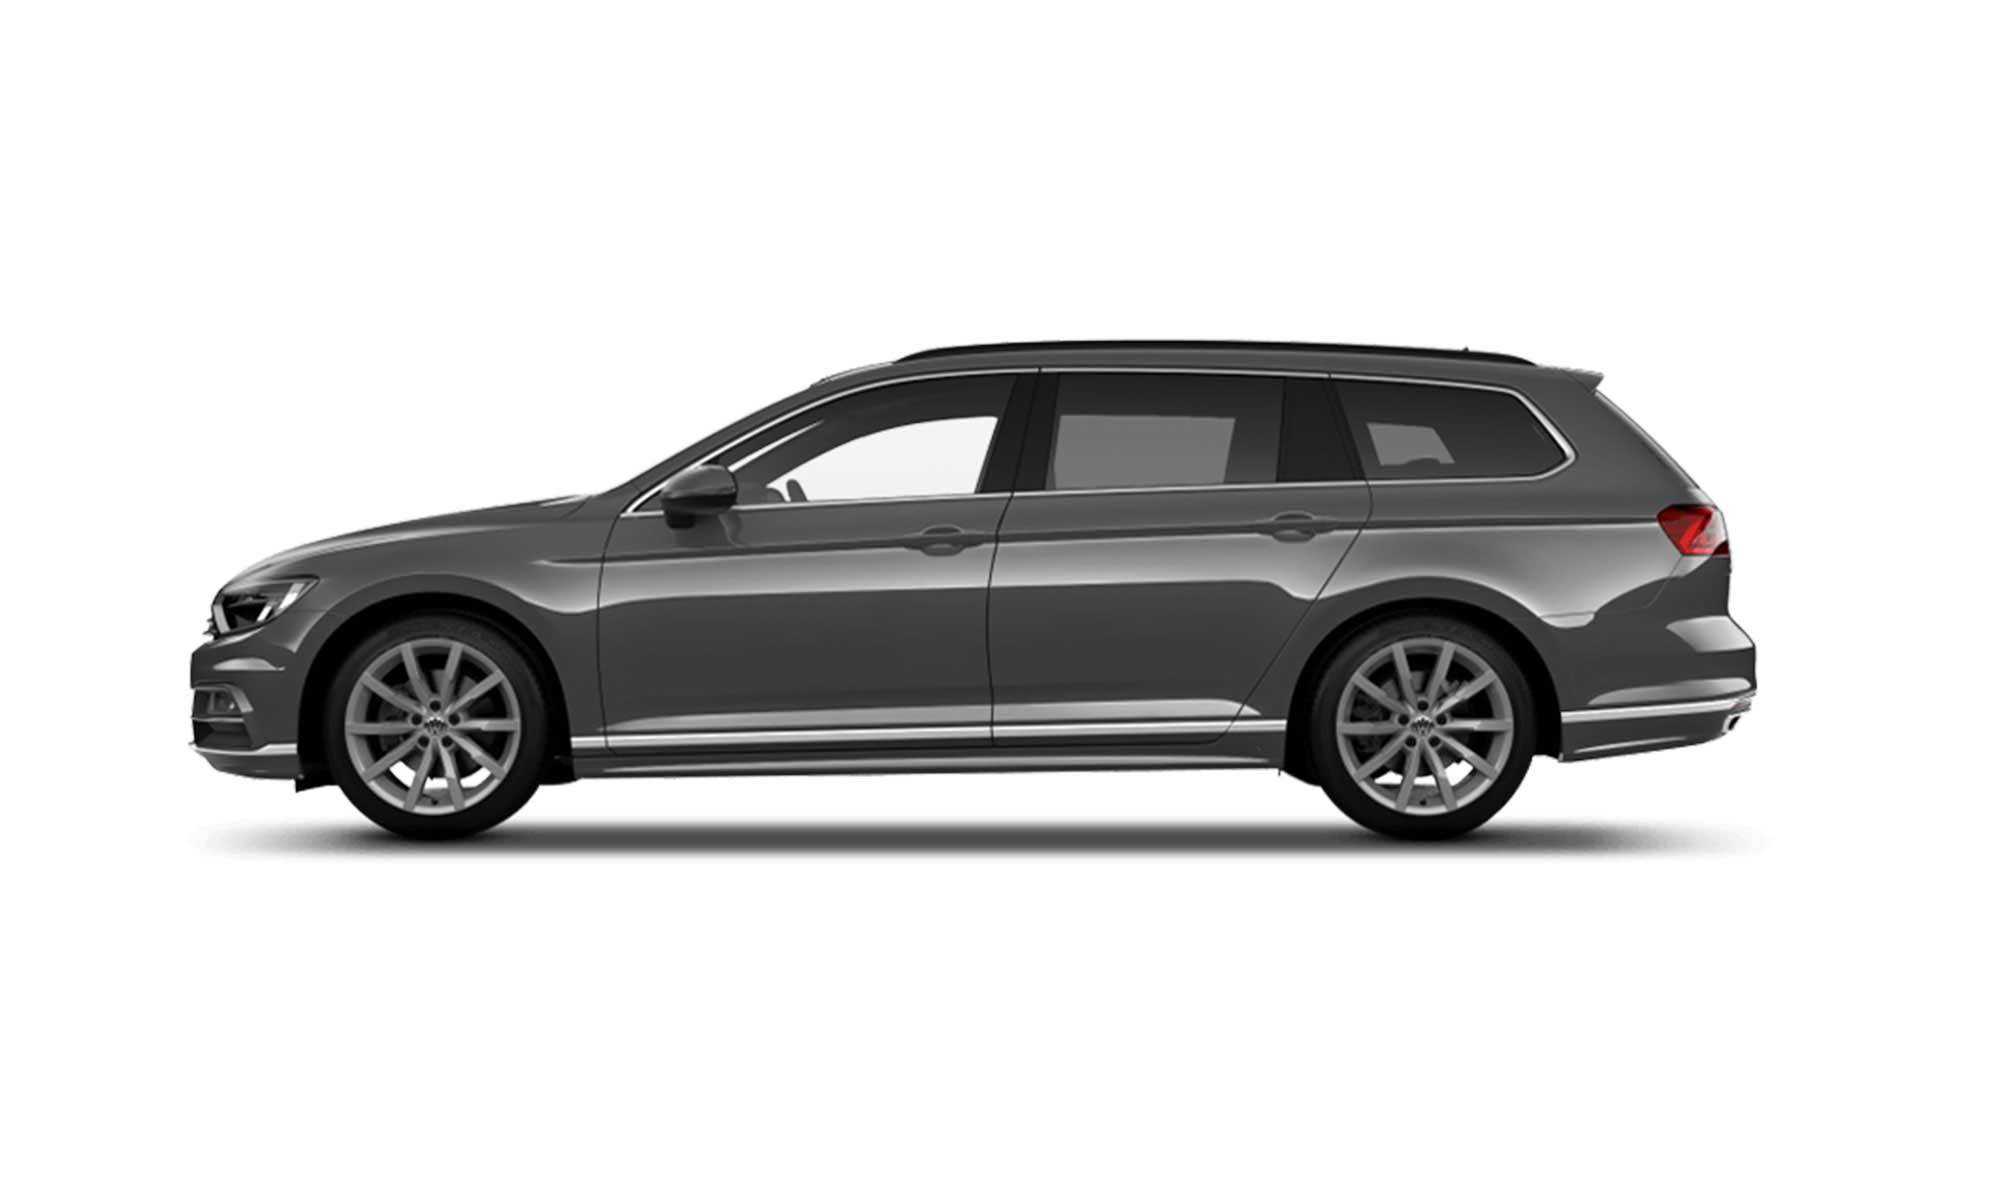 Volkswagen Passat Estate GTE (2015)